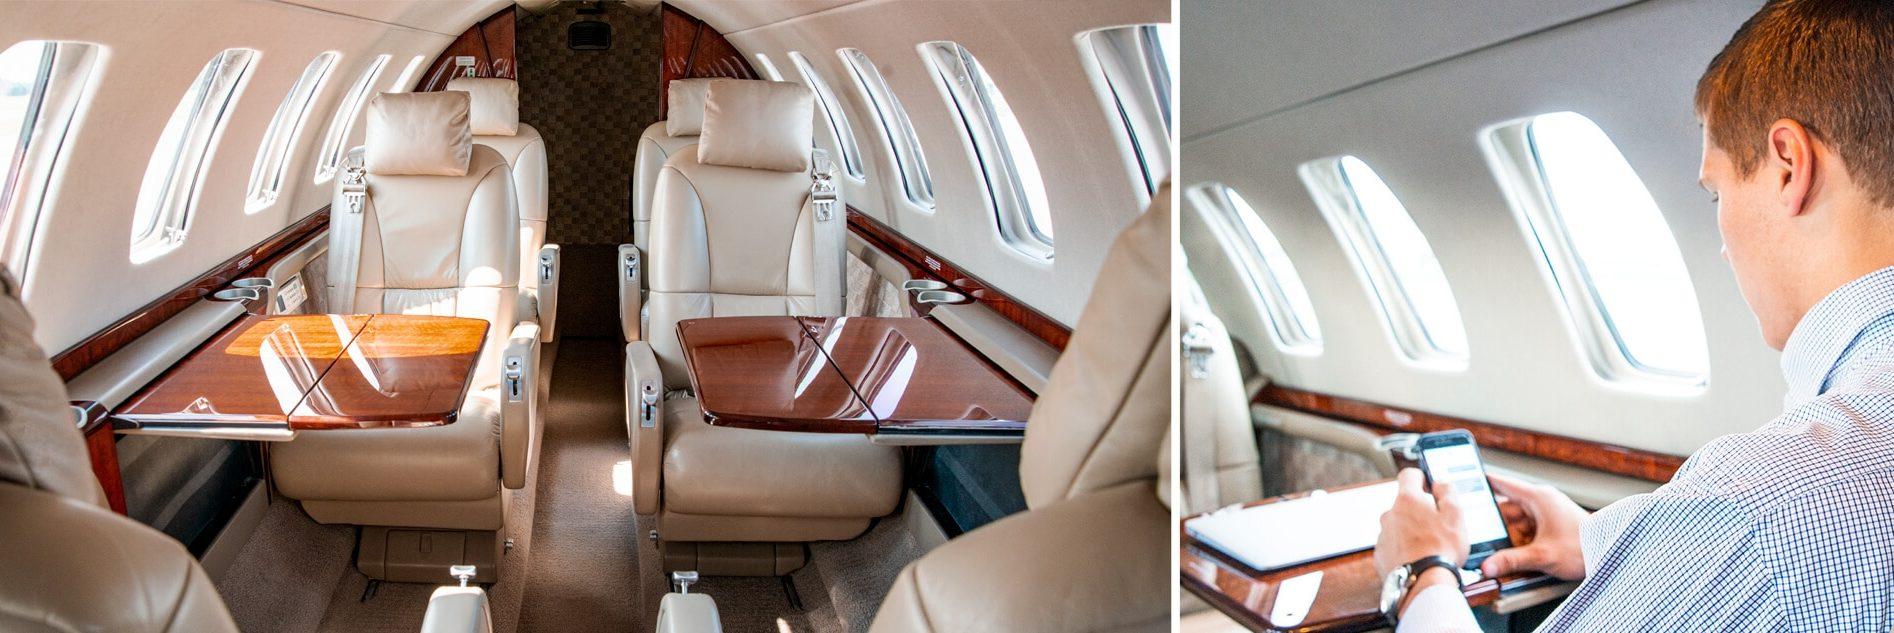 Cessna Citation CJ3 Interior with Wifi Capabilities